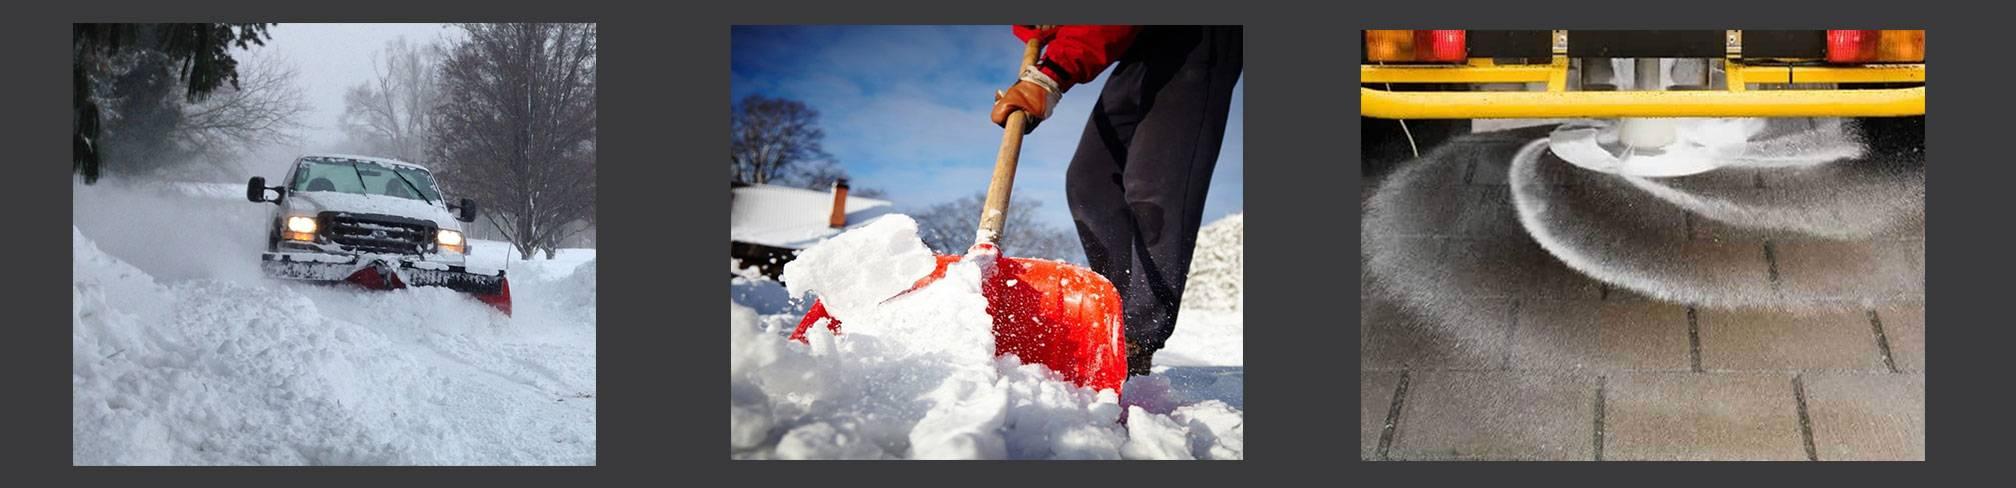 https://landmarklandscapes.pro/wp-content/uploads/2018/04/snow-removal.jpg